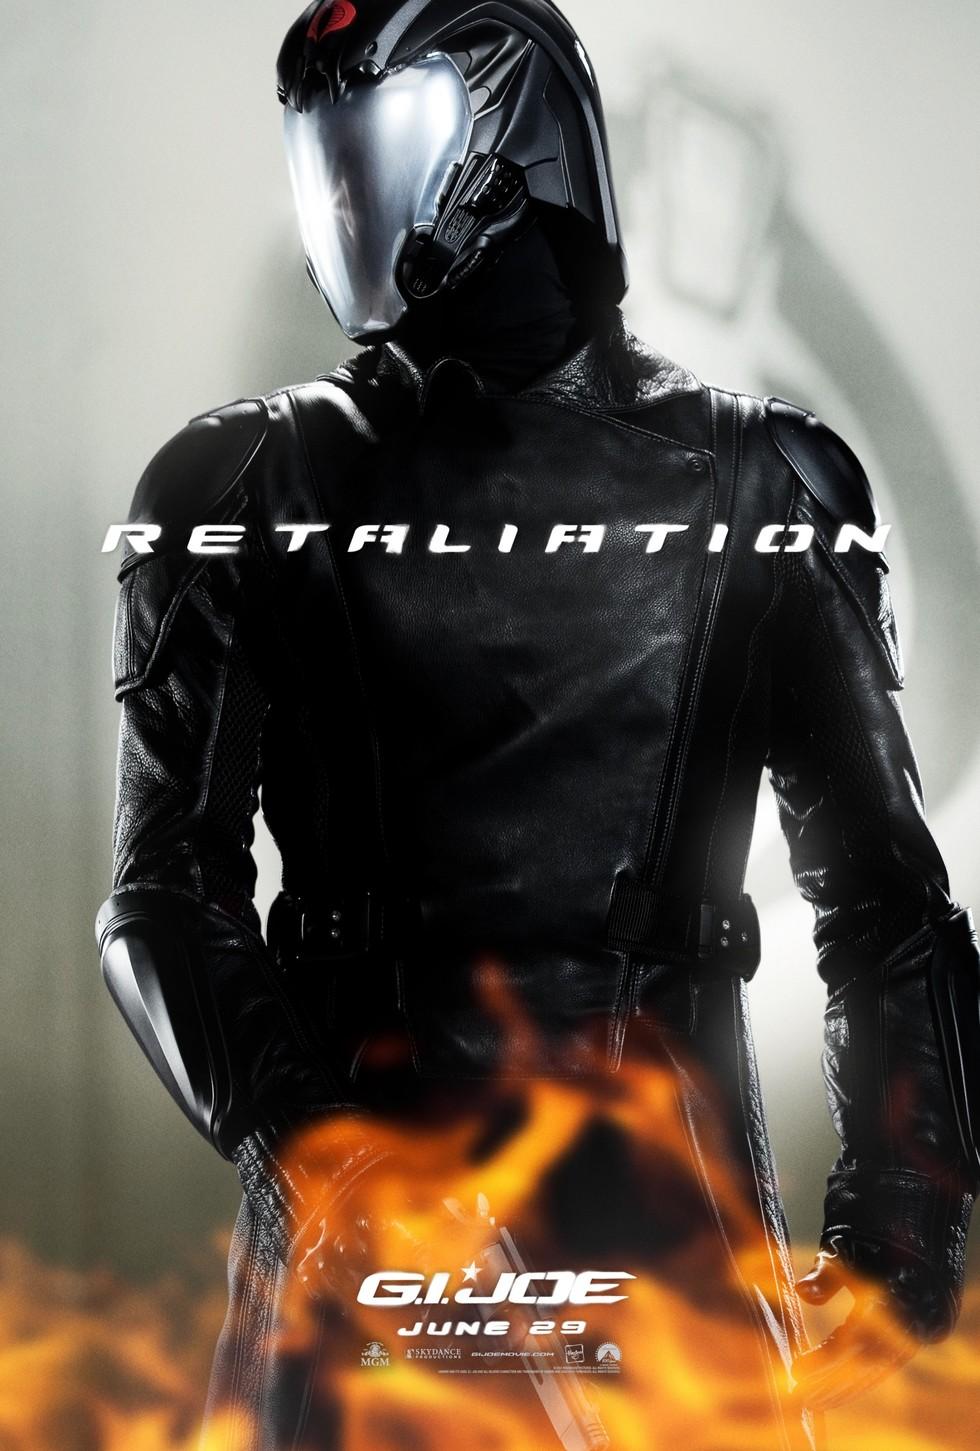 G.I. Joe: Retaliation - Movie Poster #12 (Large)